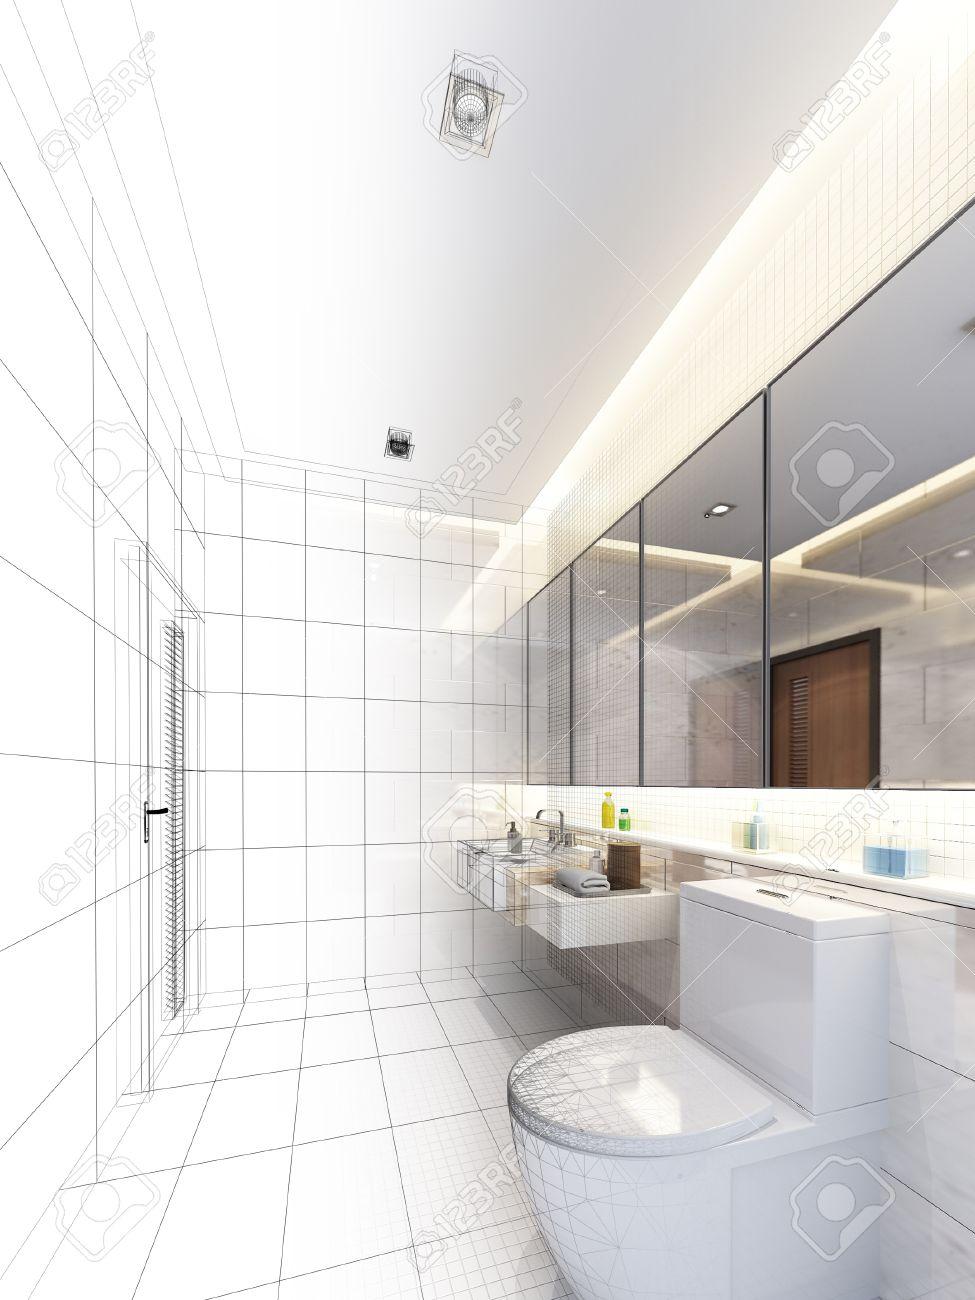 Sketch Design Of Interior Bathroom Stock Photo